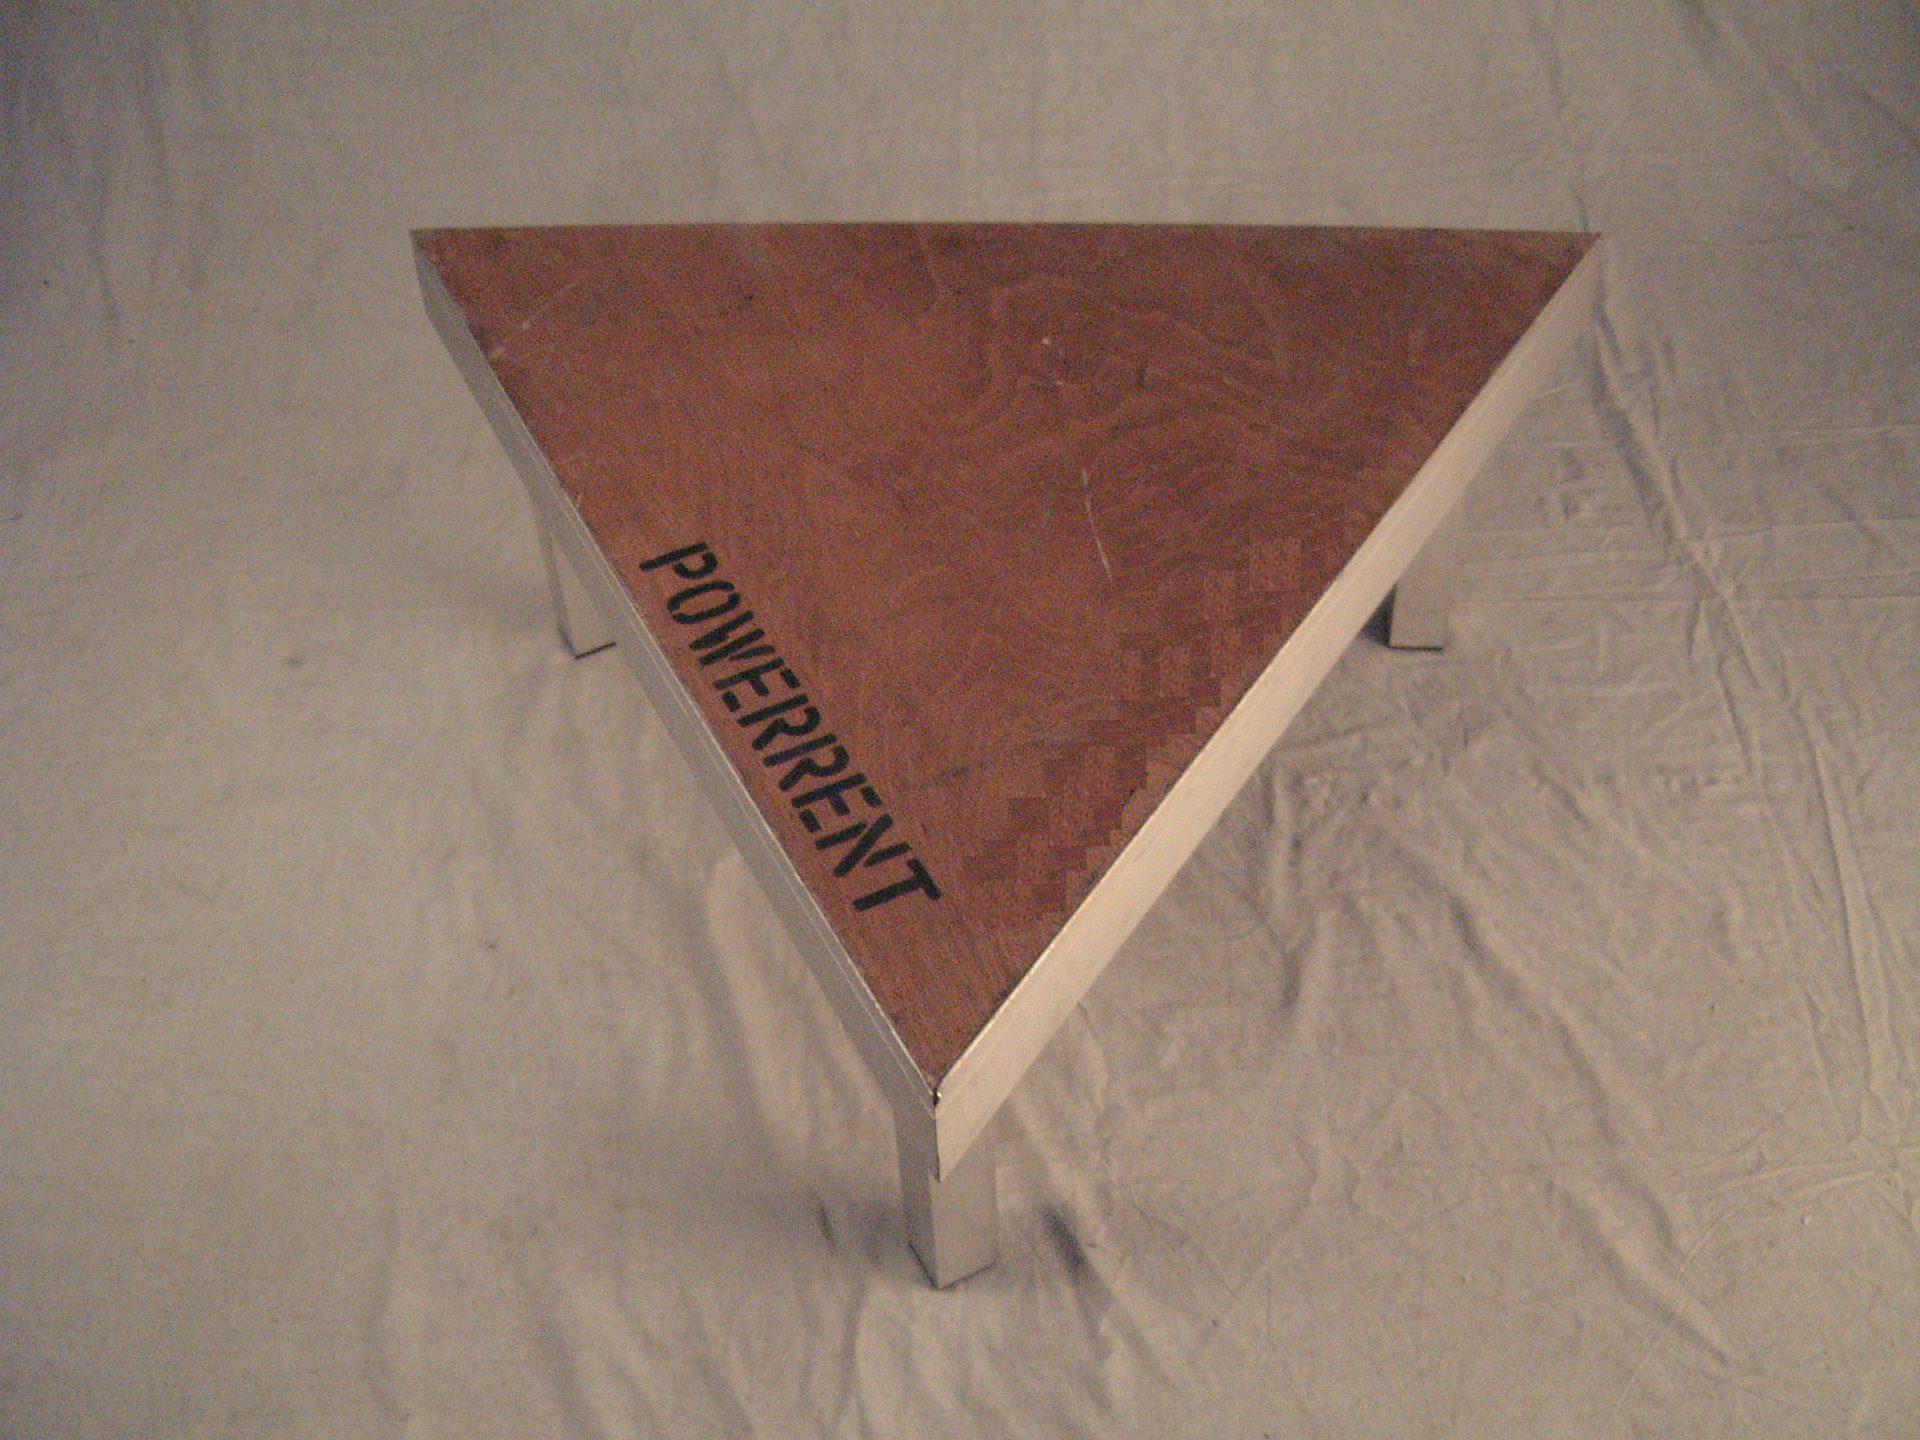 Dreieck Buehnenelement 1m x1m x1mm x 1m 1m x1m x1m